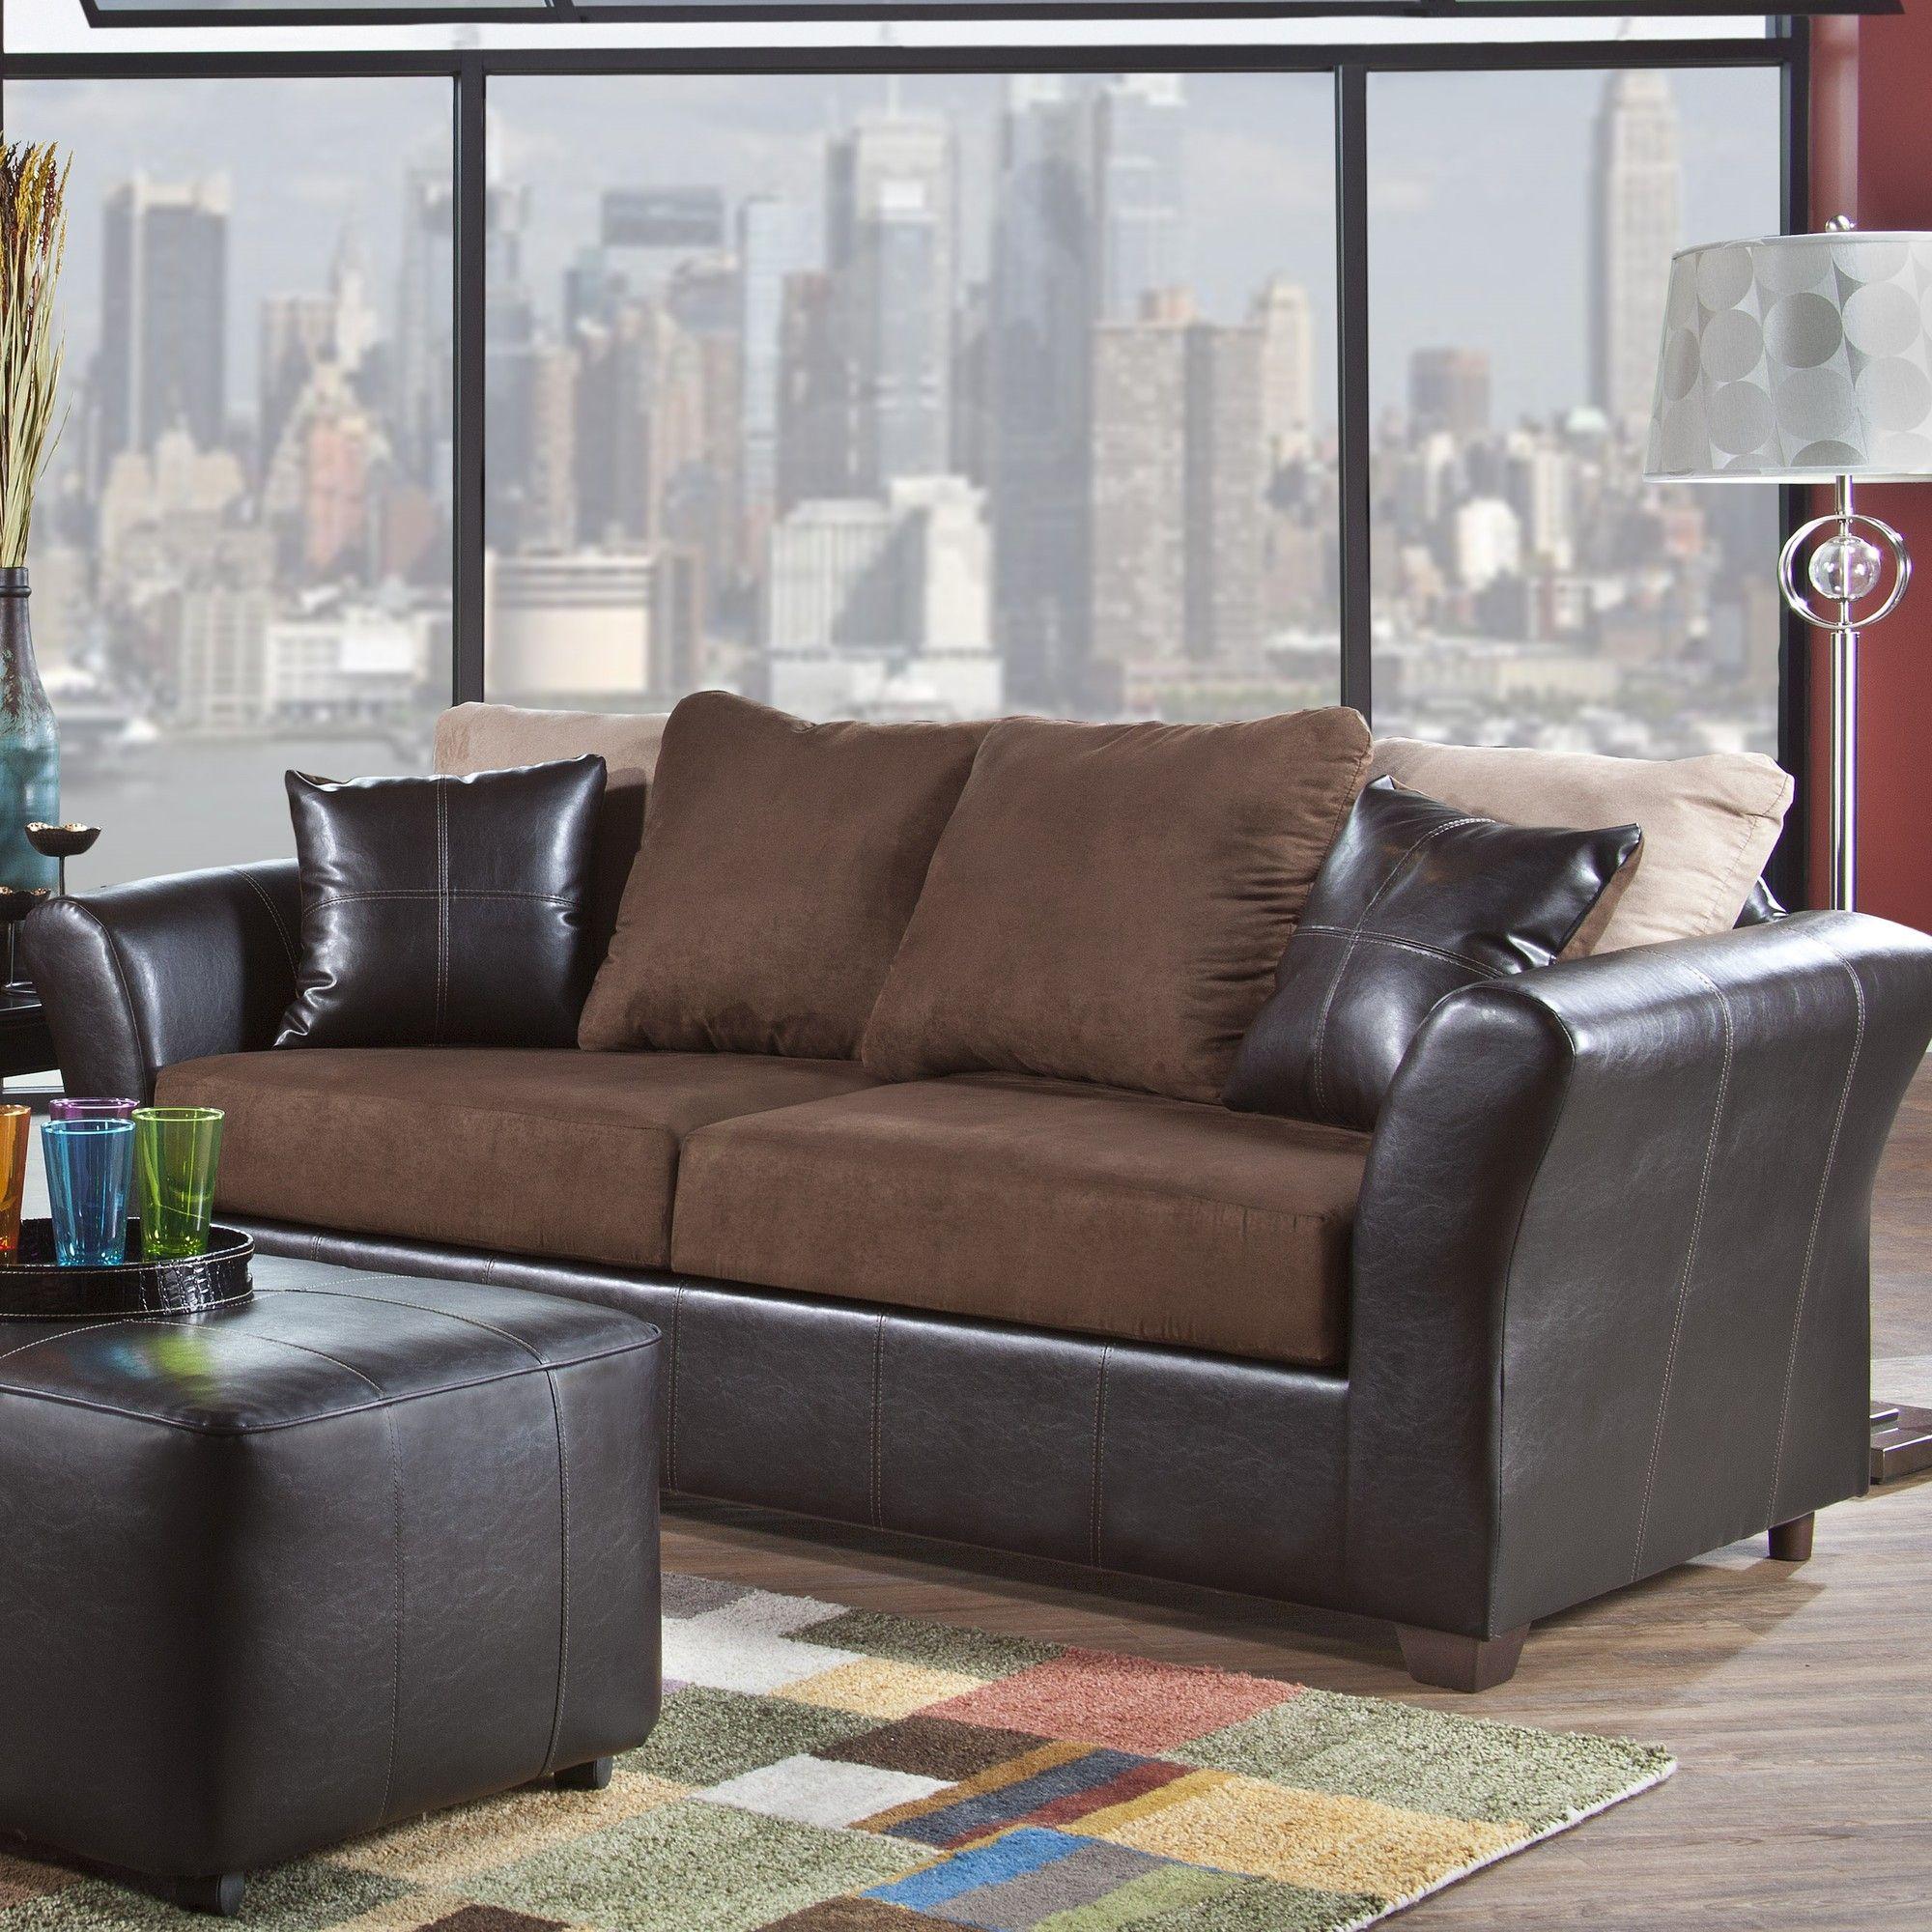 Groovy Serta Upholstery Bishopston San Marino Loveseat Products Machost Co Dining Chair Design Ideas Machostcouk